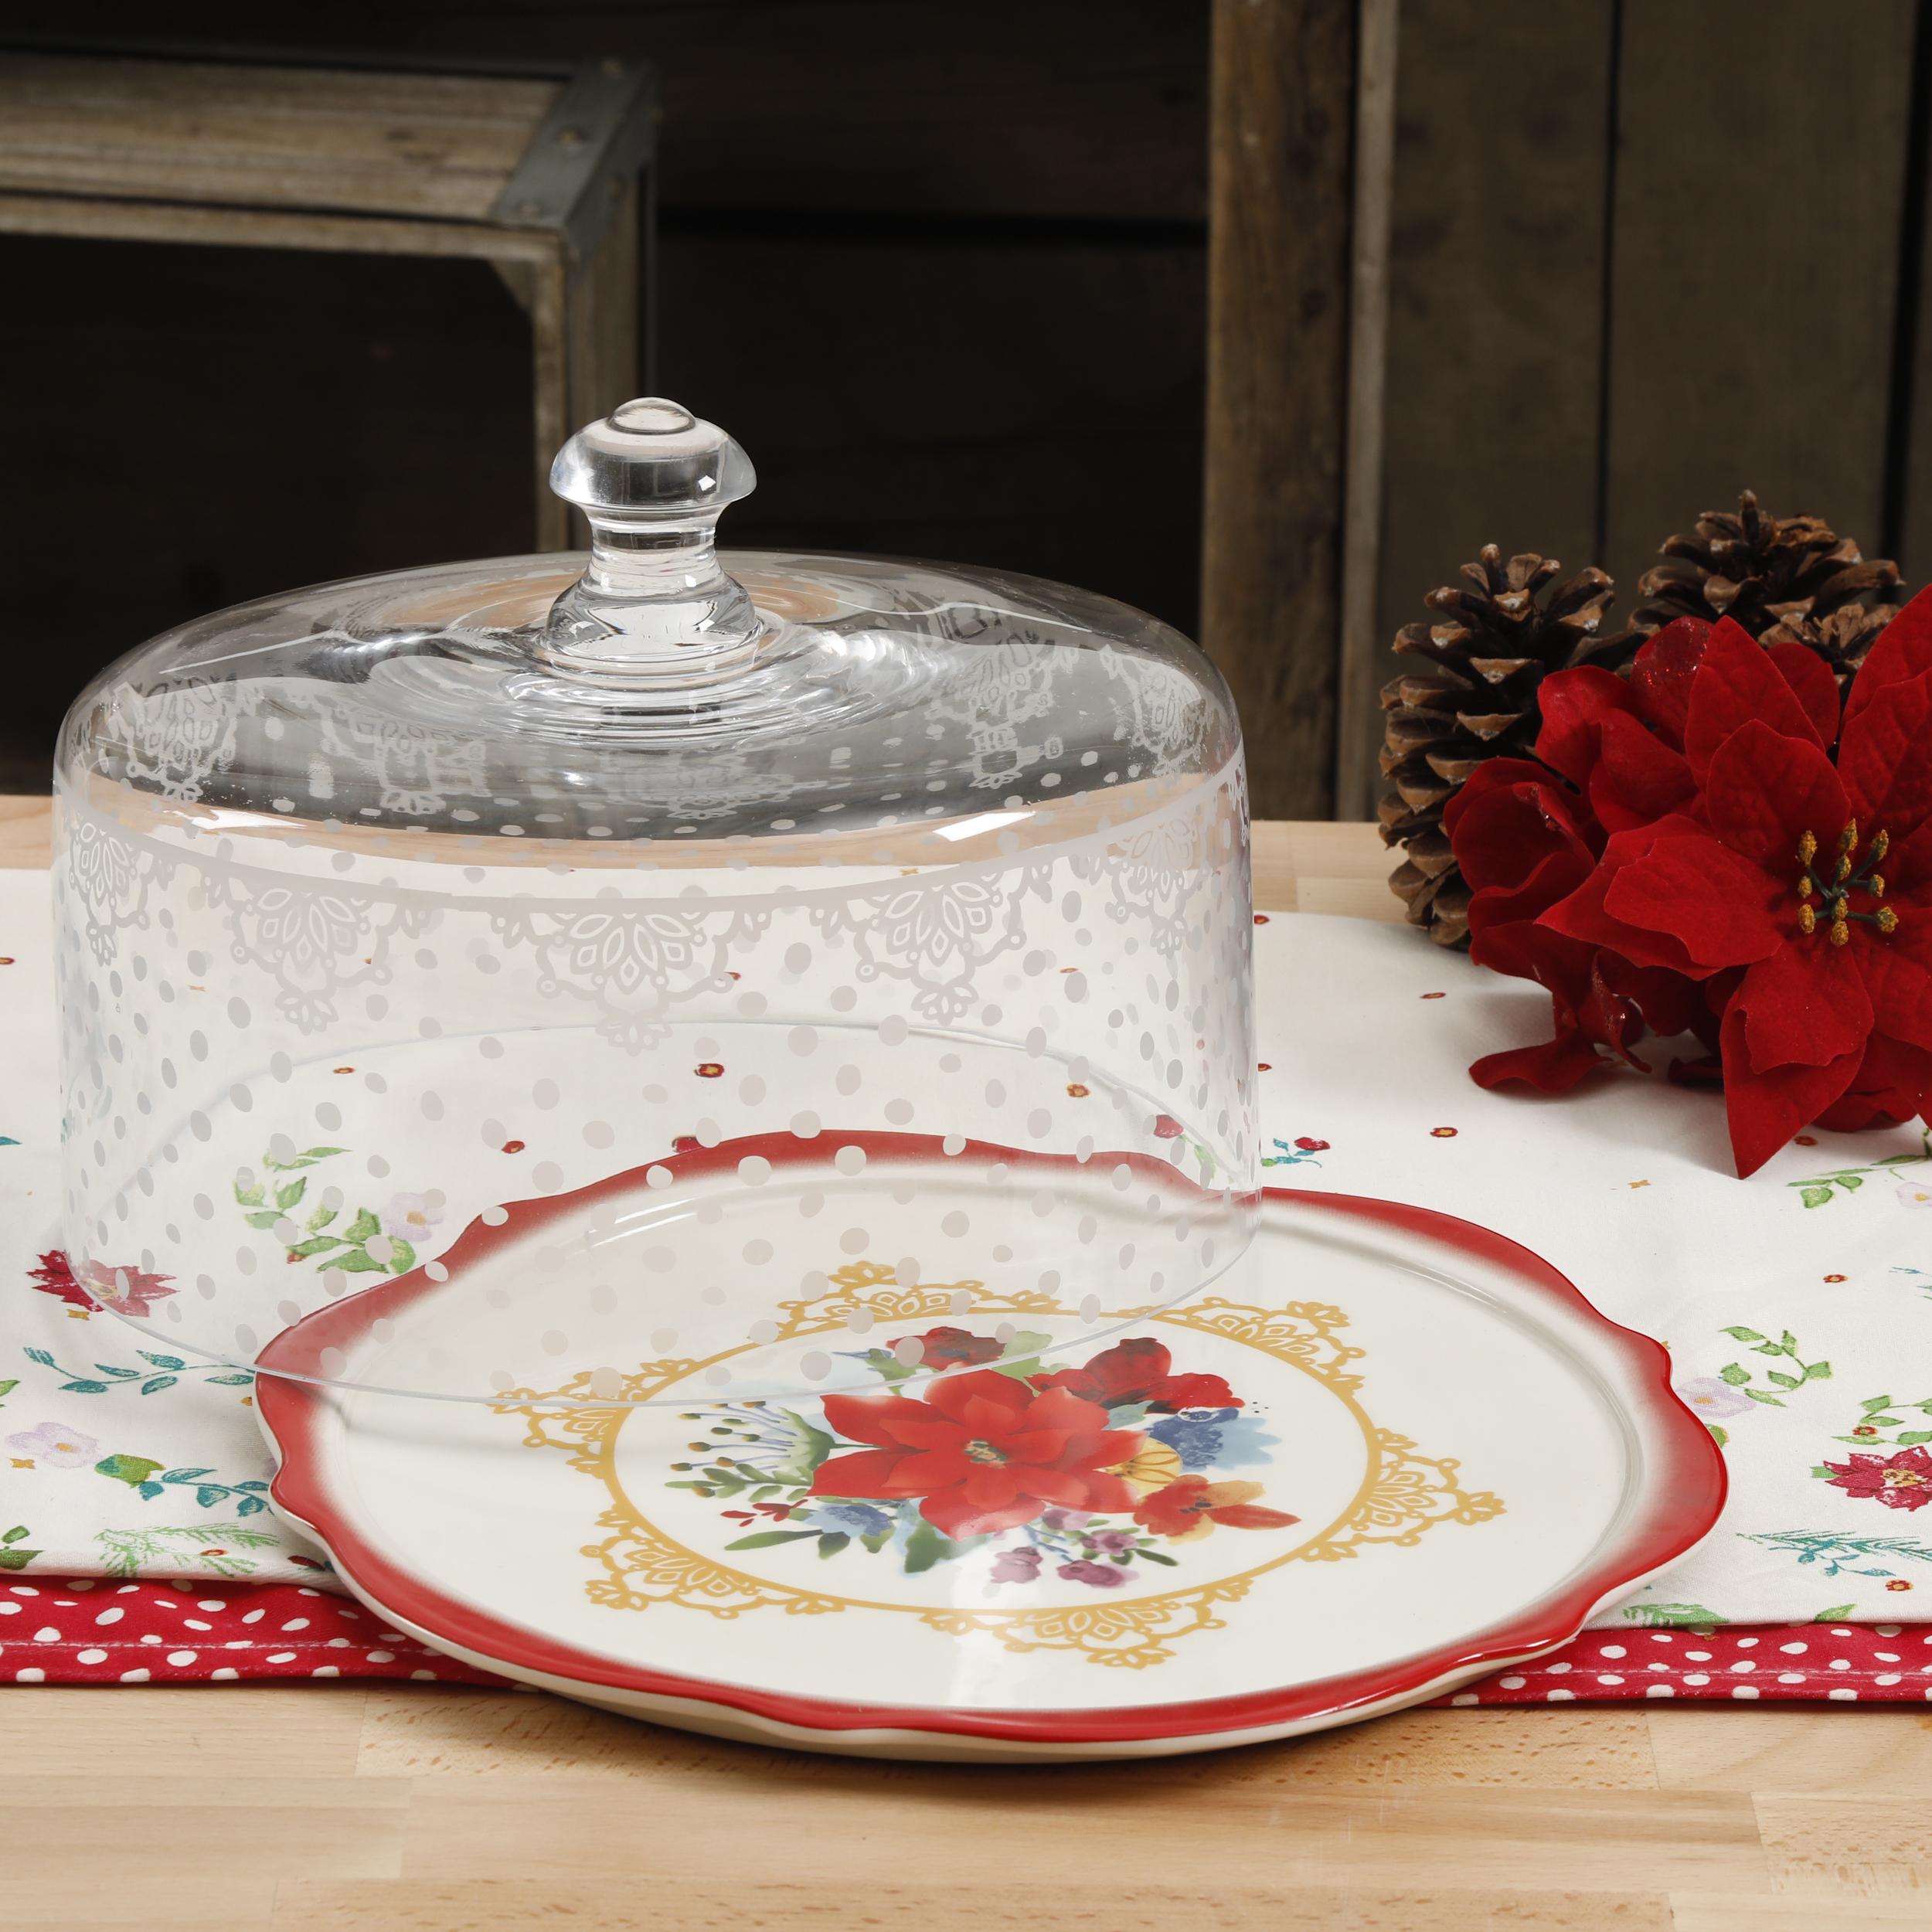 10 Inch Glass Cake Dome